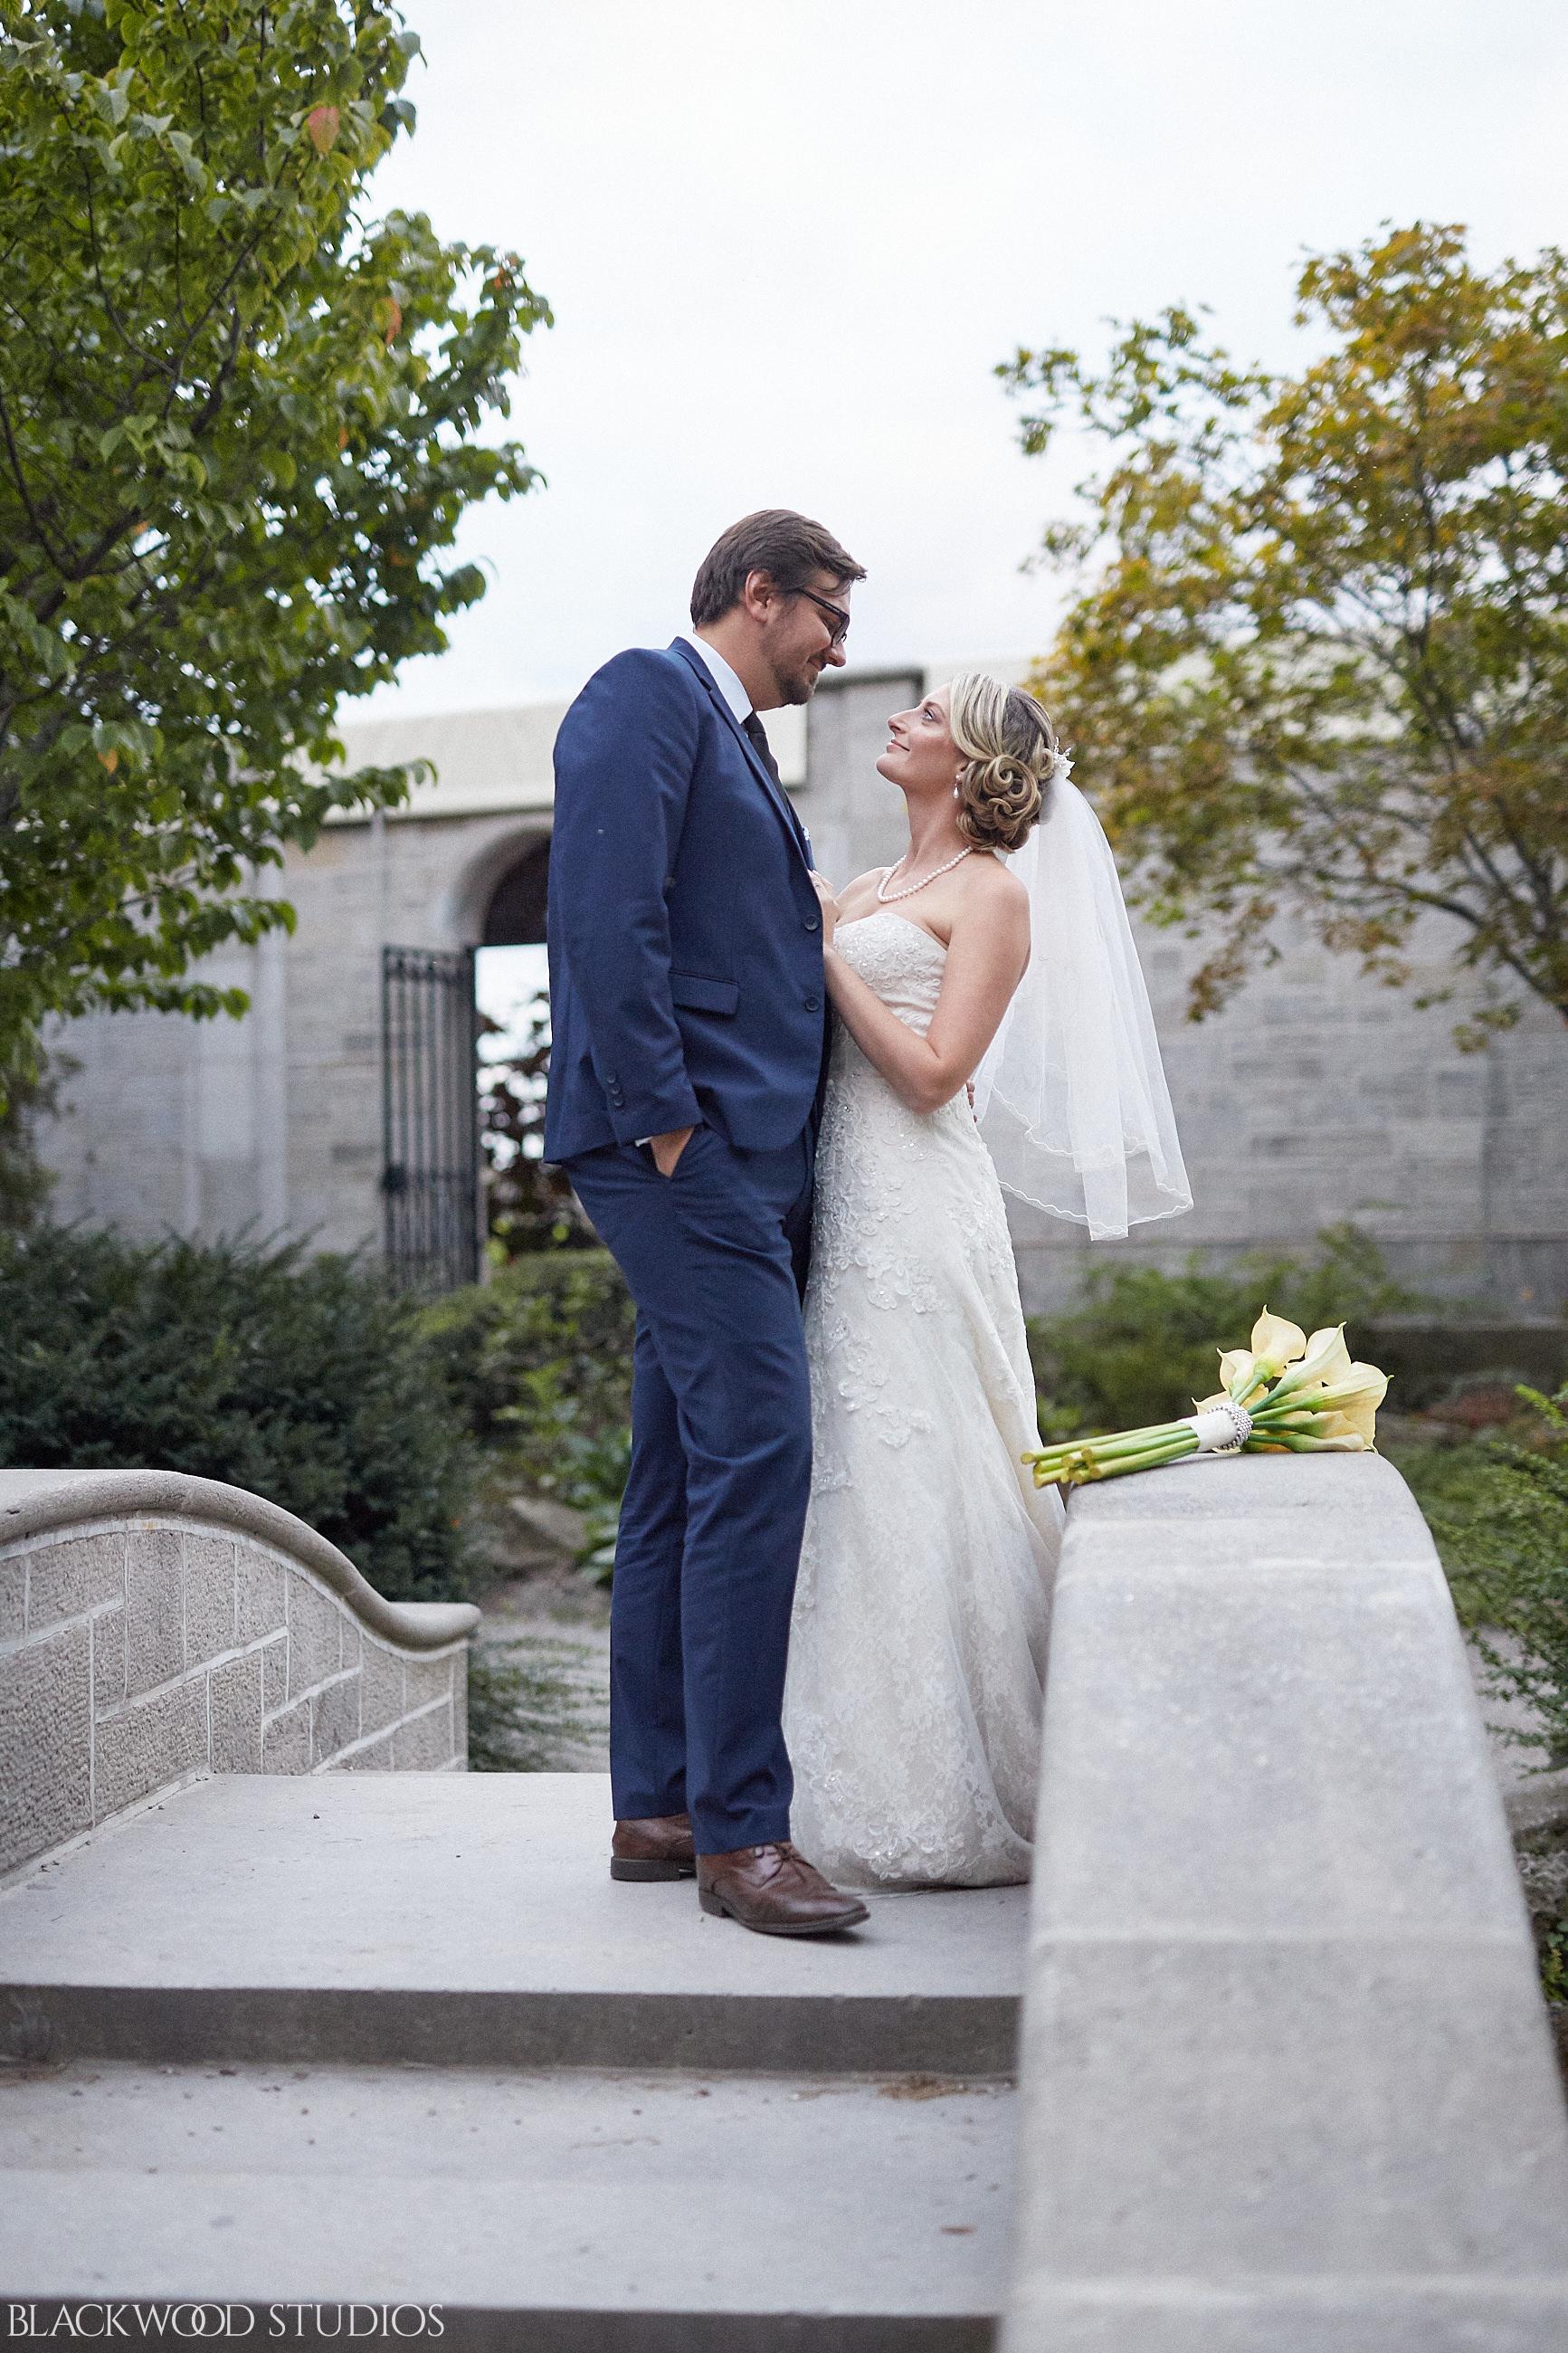 Blackwood-Studios-Wedding-Photography-20170928-184710-Marek-Katie-Michalek-Oakes-Garden-Theatre-Niagara-Falls-Ontario-Canada.jpg